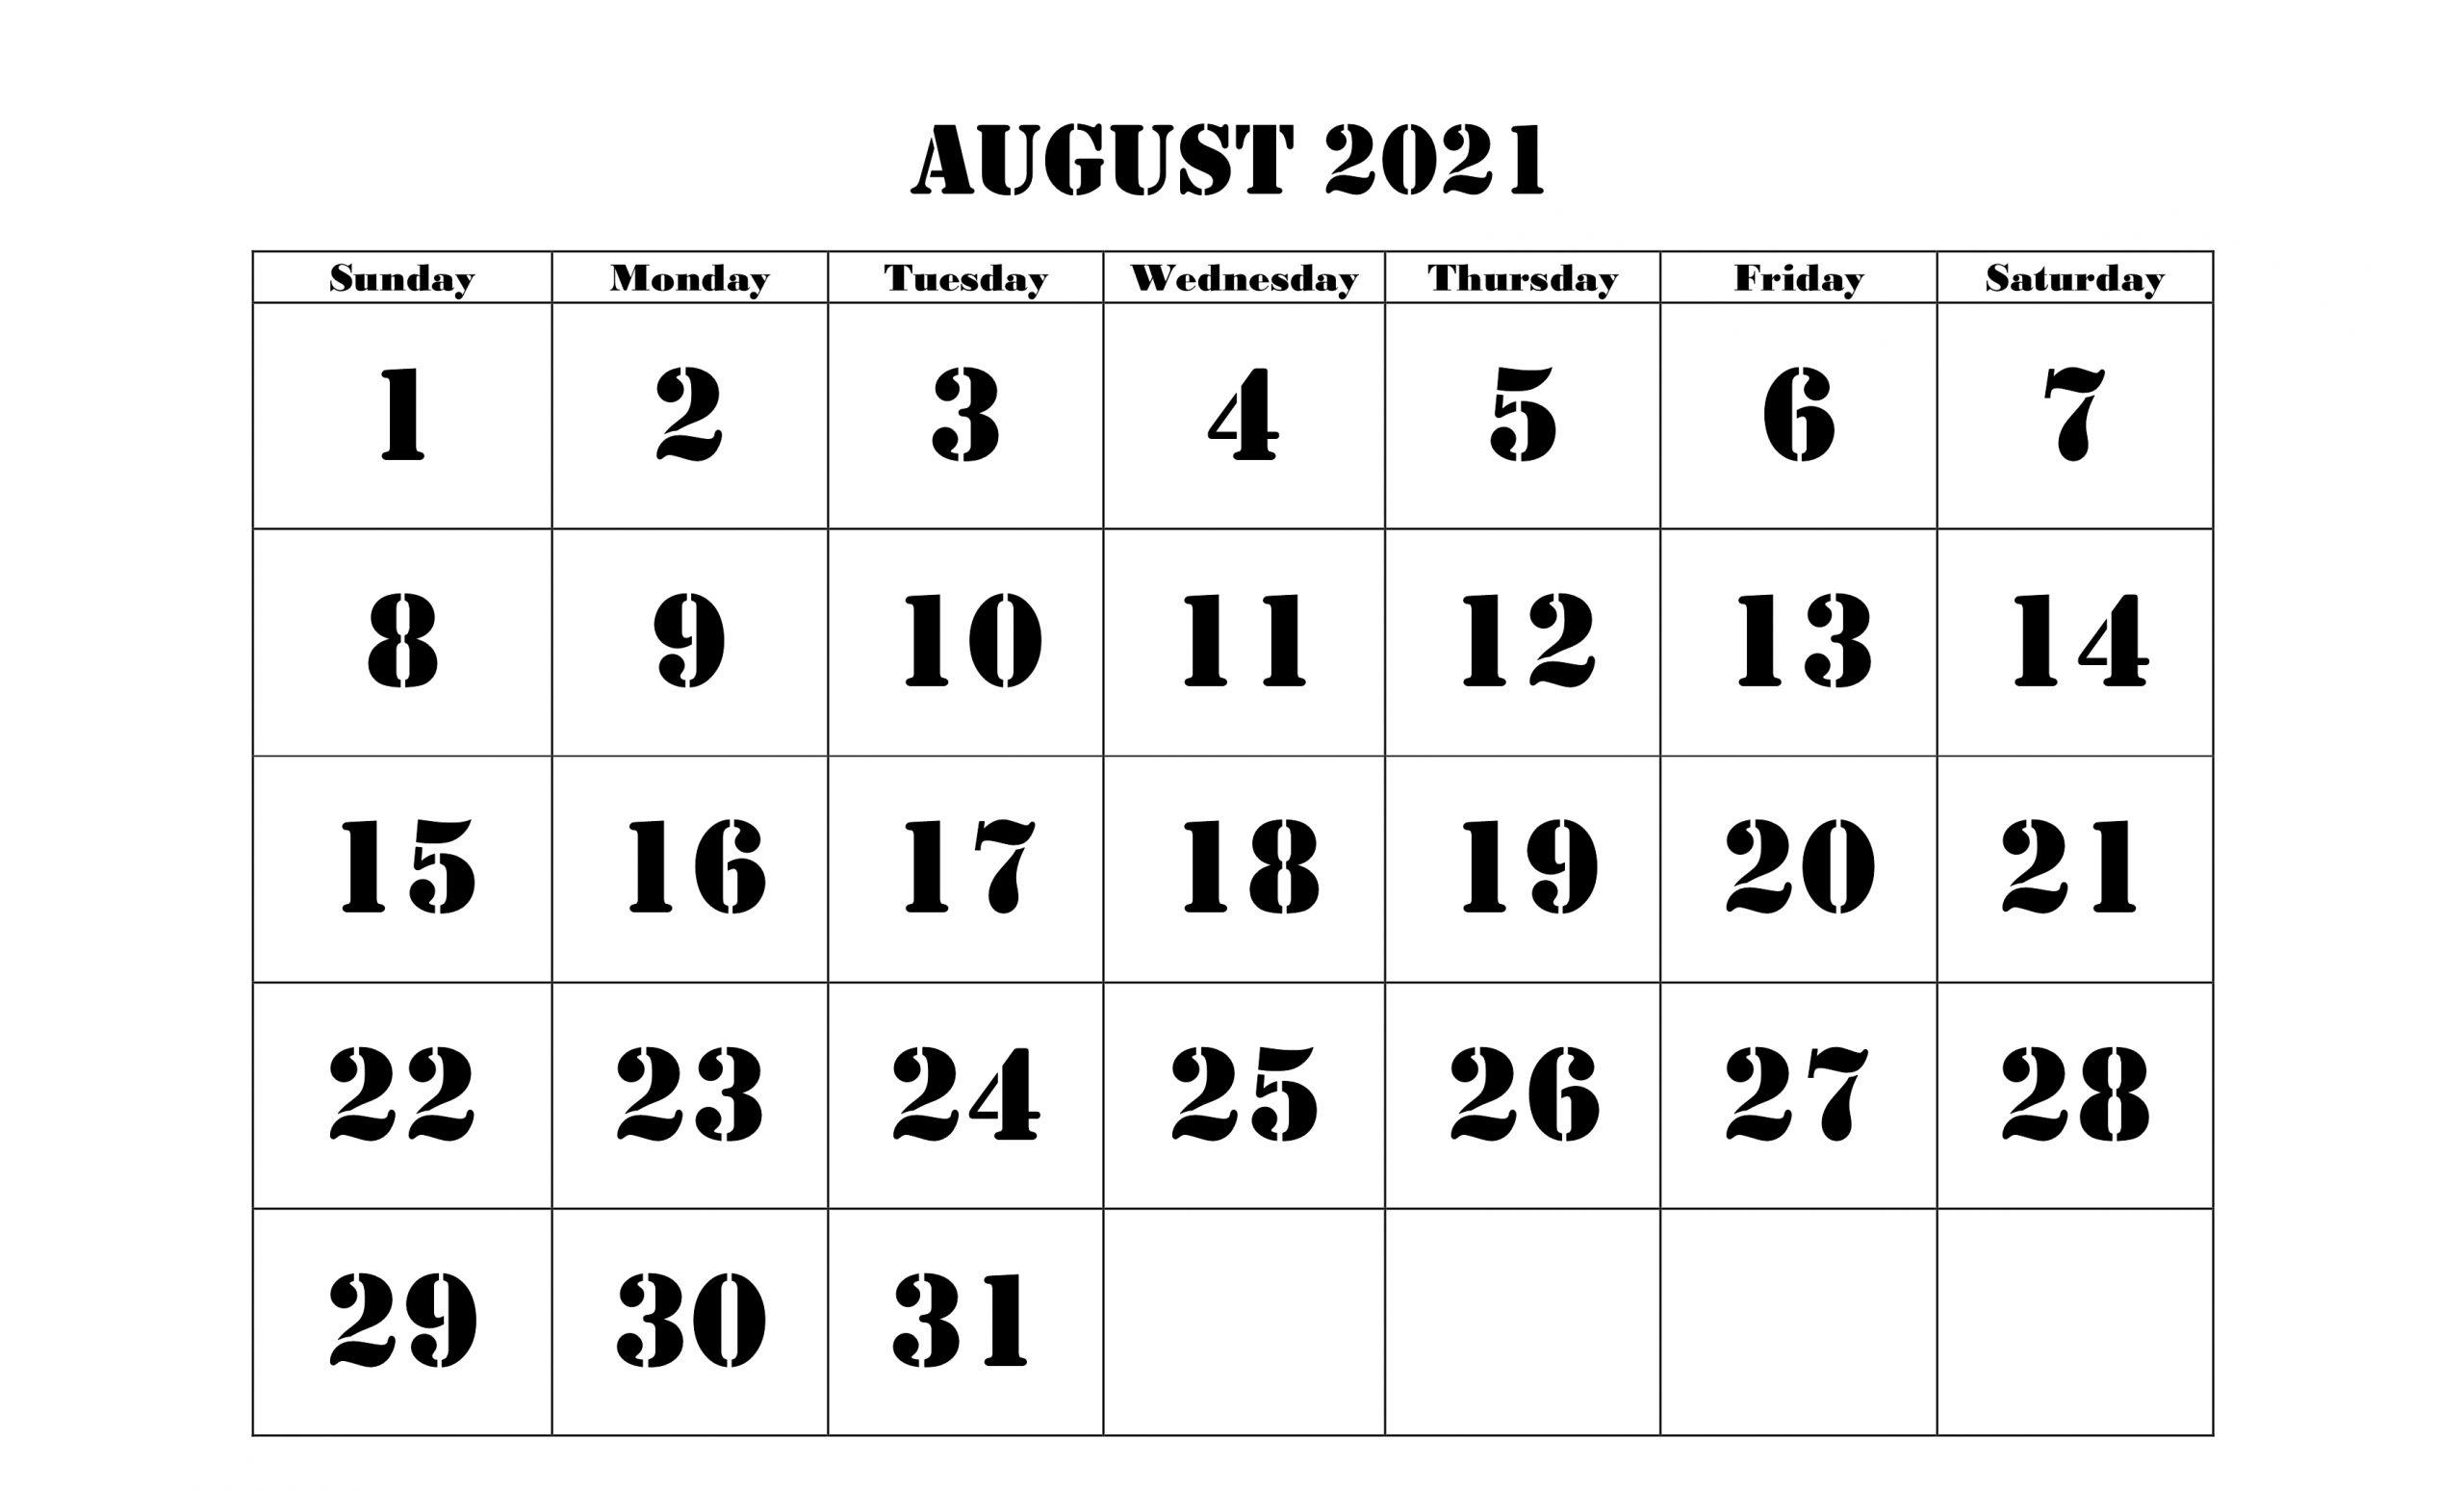 August 2021 Calendar Holidays